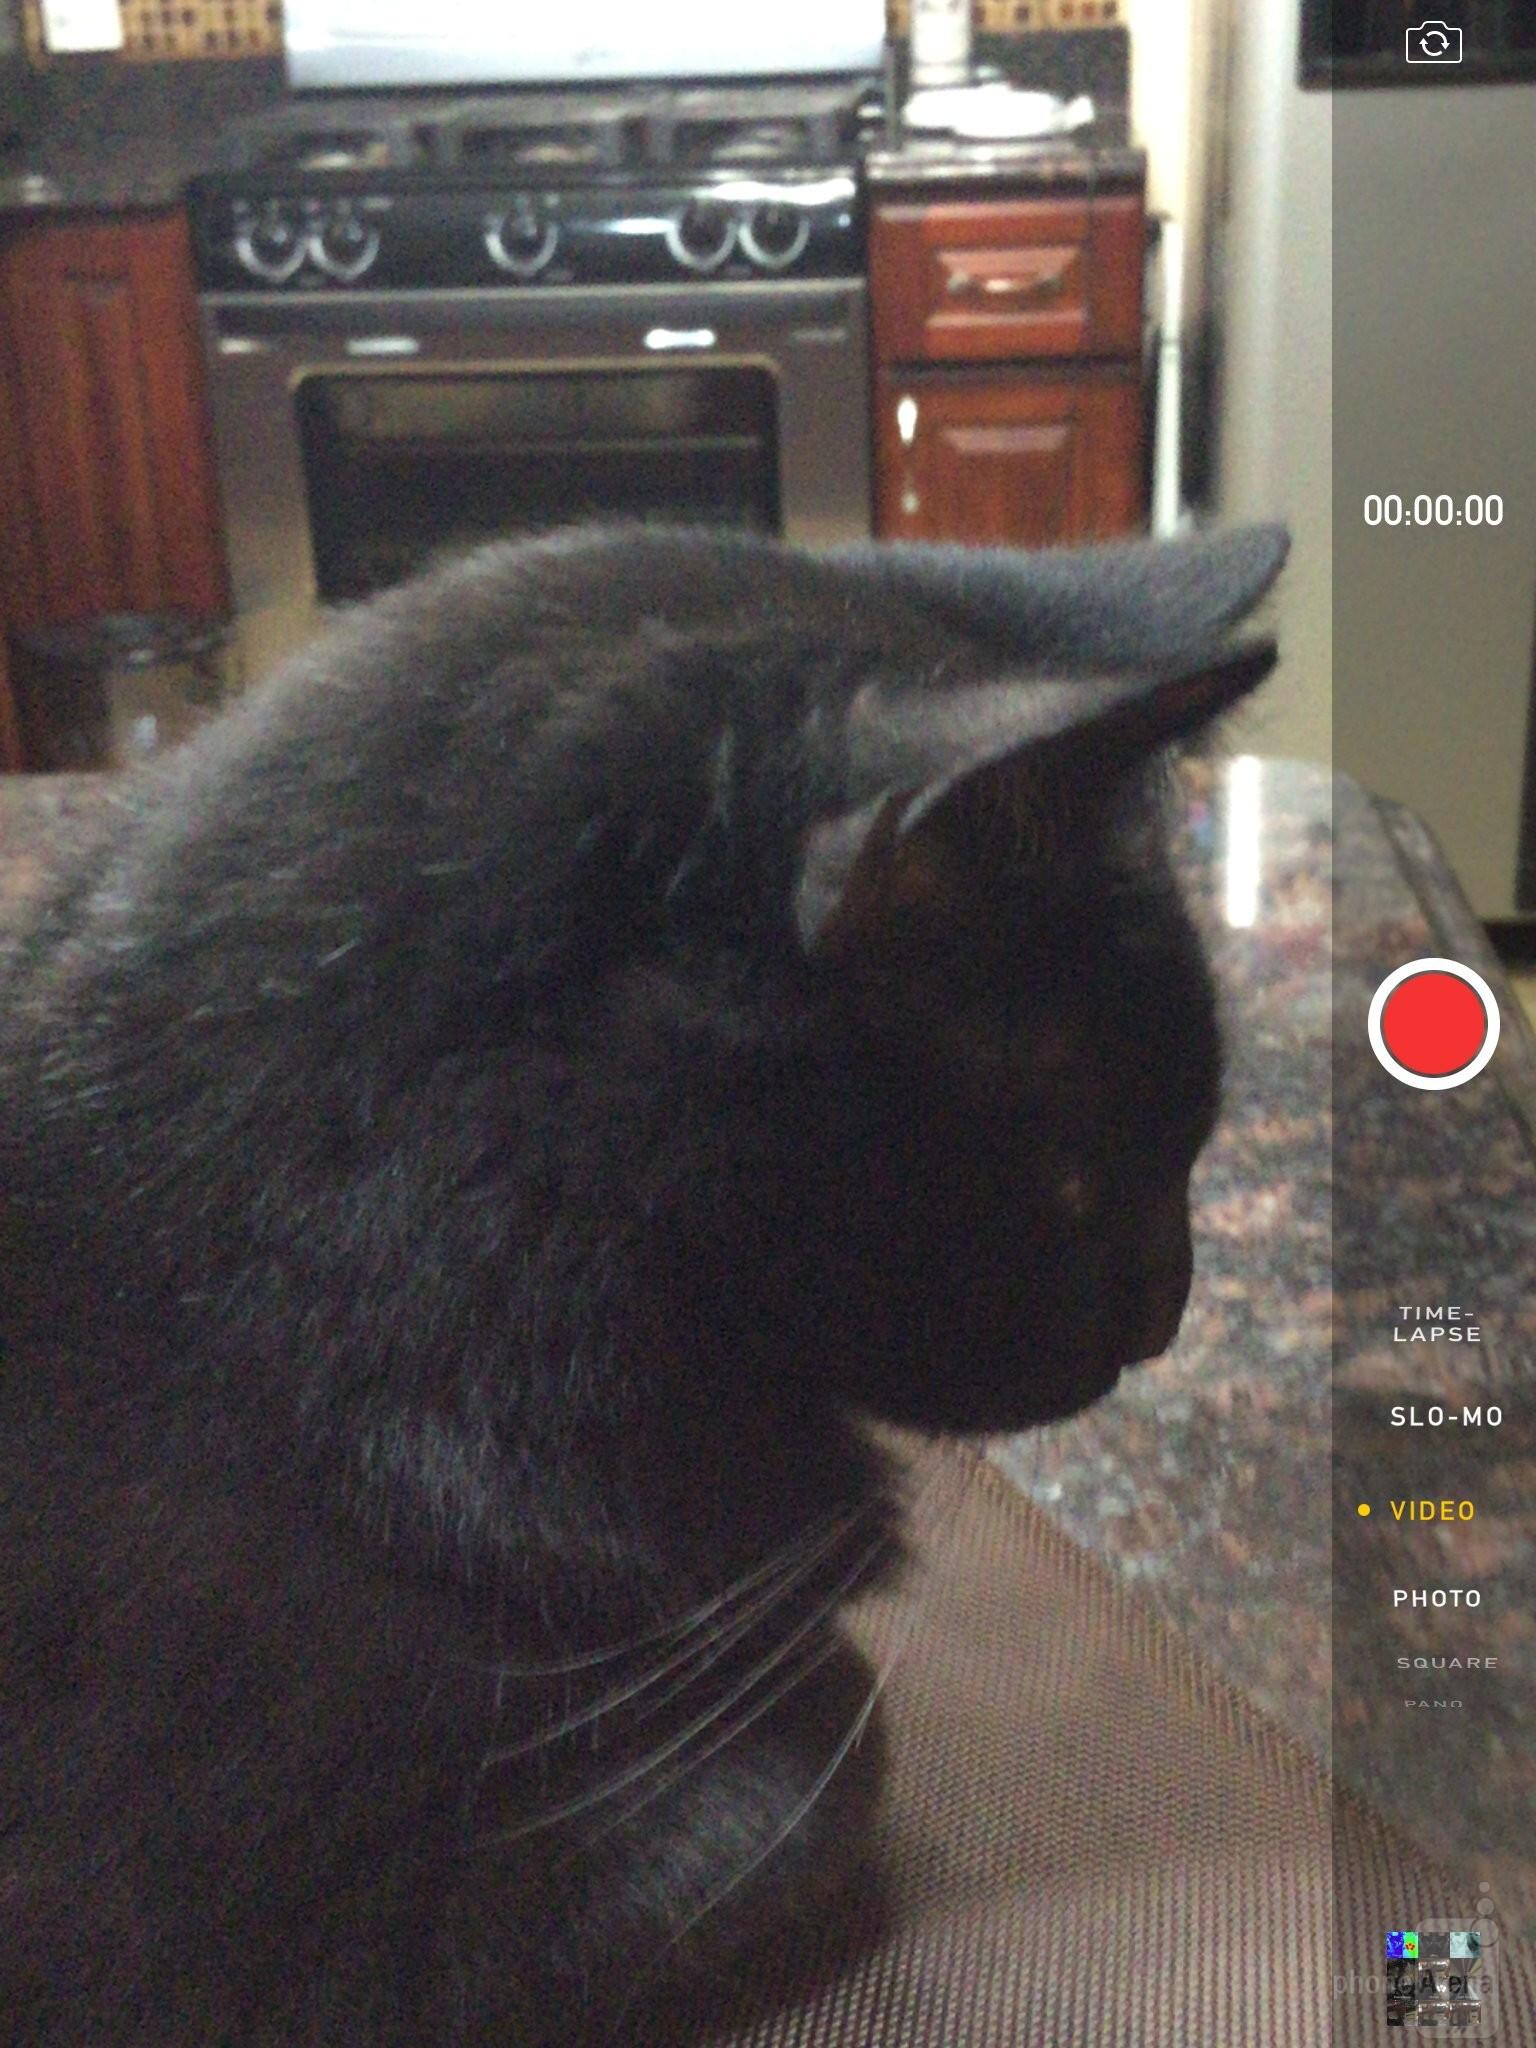 Apple Ipad Air 2 Vs Apple Ipad Mini 3 Camera And Multimedia